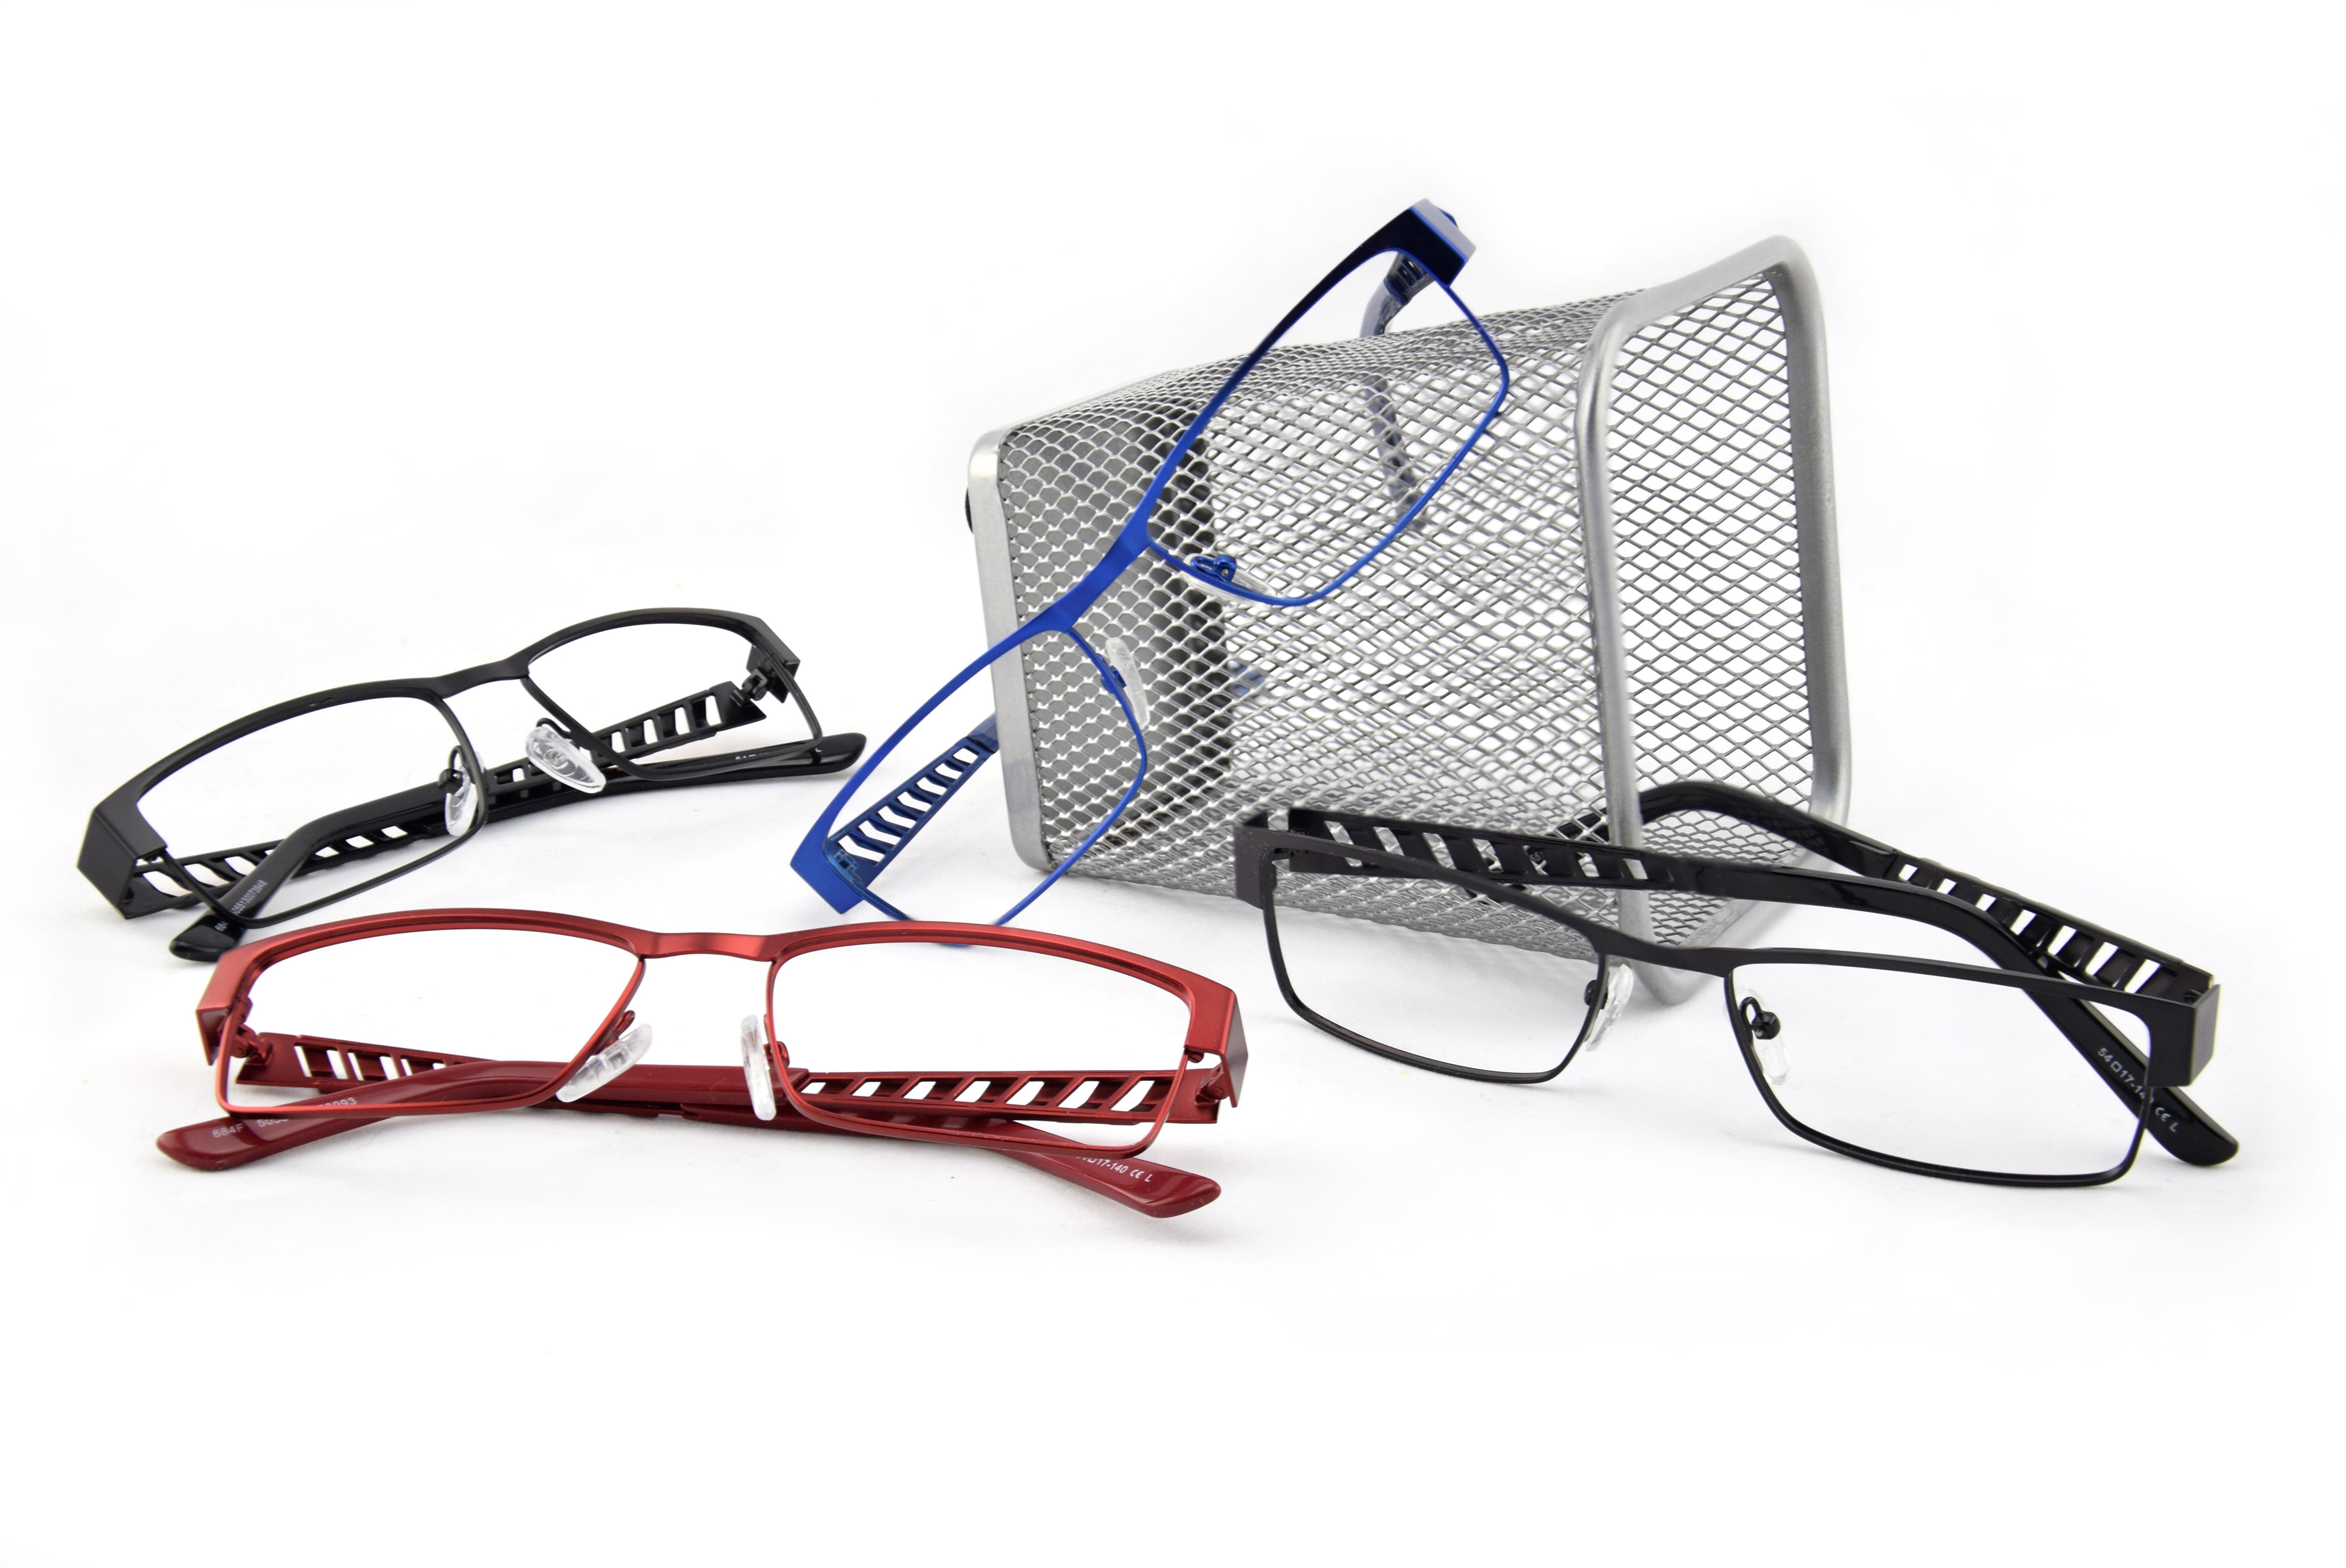 fassung der woche kw 7 edle farben brillenparty. Black Bedroom Furniture Sets. Home Design Ideas